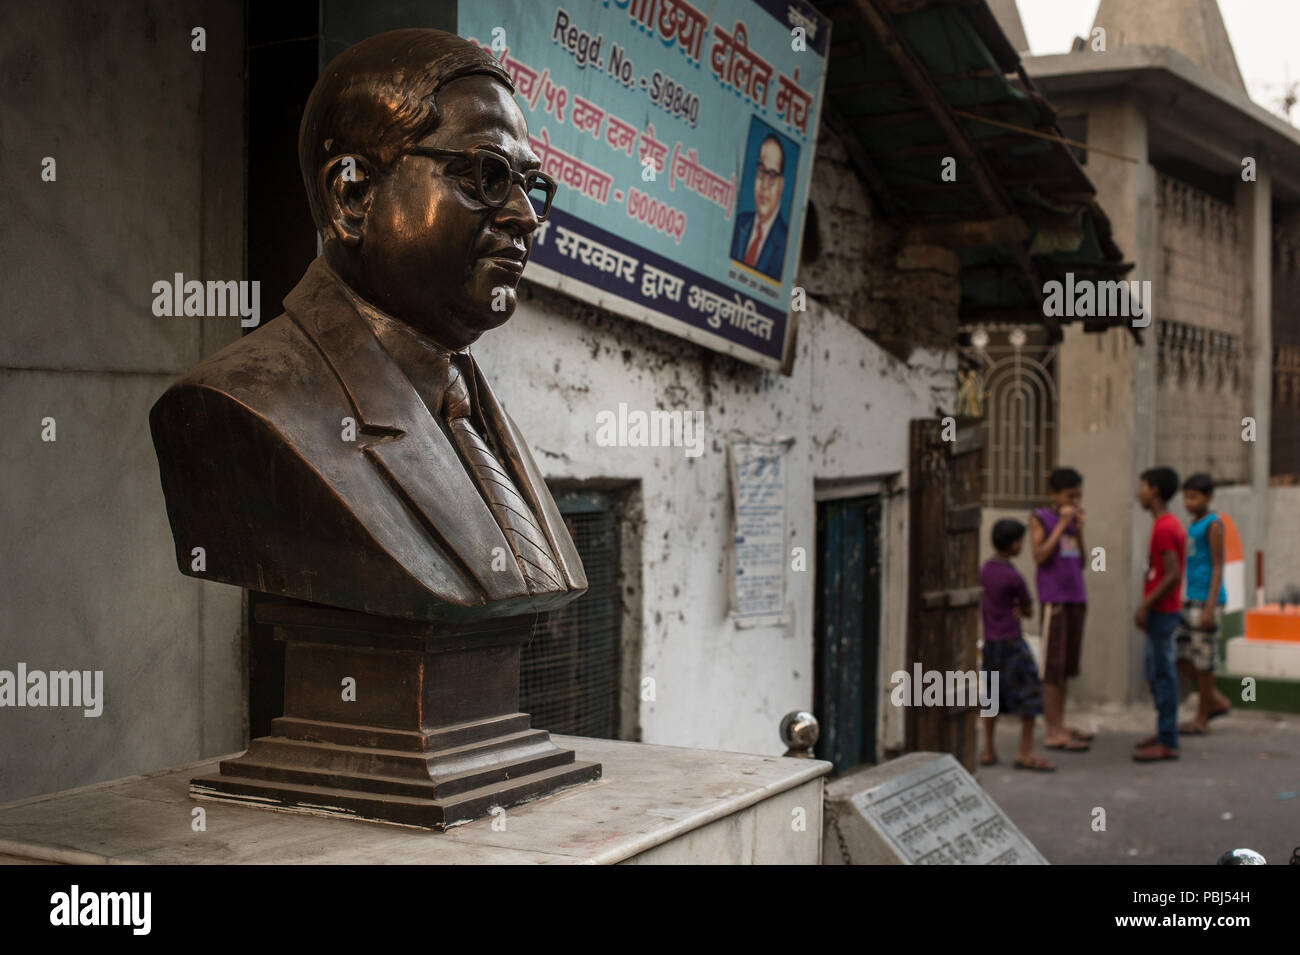 Estatua del Dr. B. R. Ambedkar, un político indio dalit (intocables) abogó fuertemente para abolir el sistema de castas. En Kolkata, India, Asia. Imagen De Stock